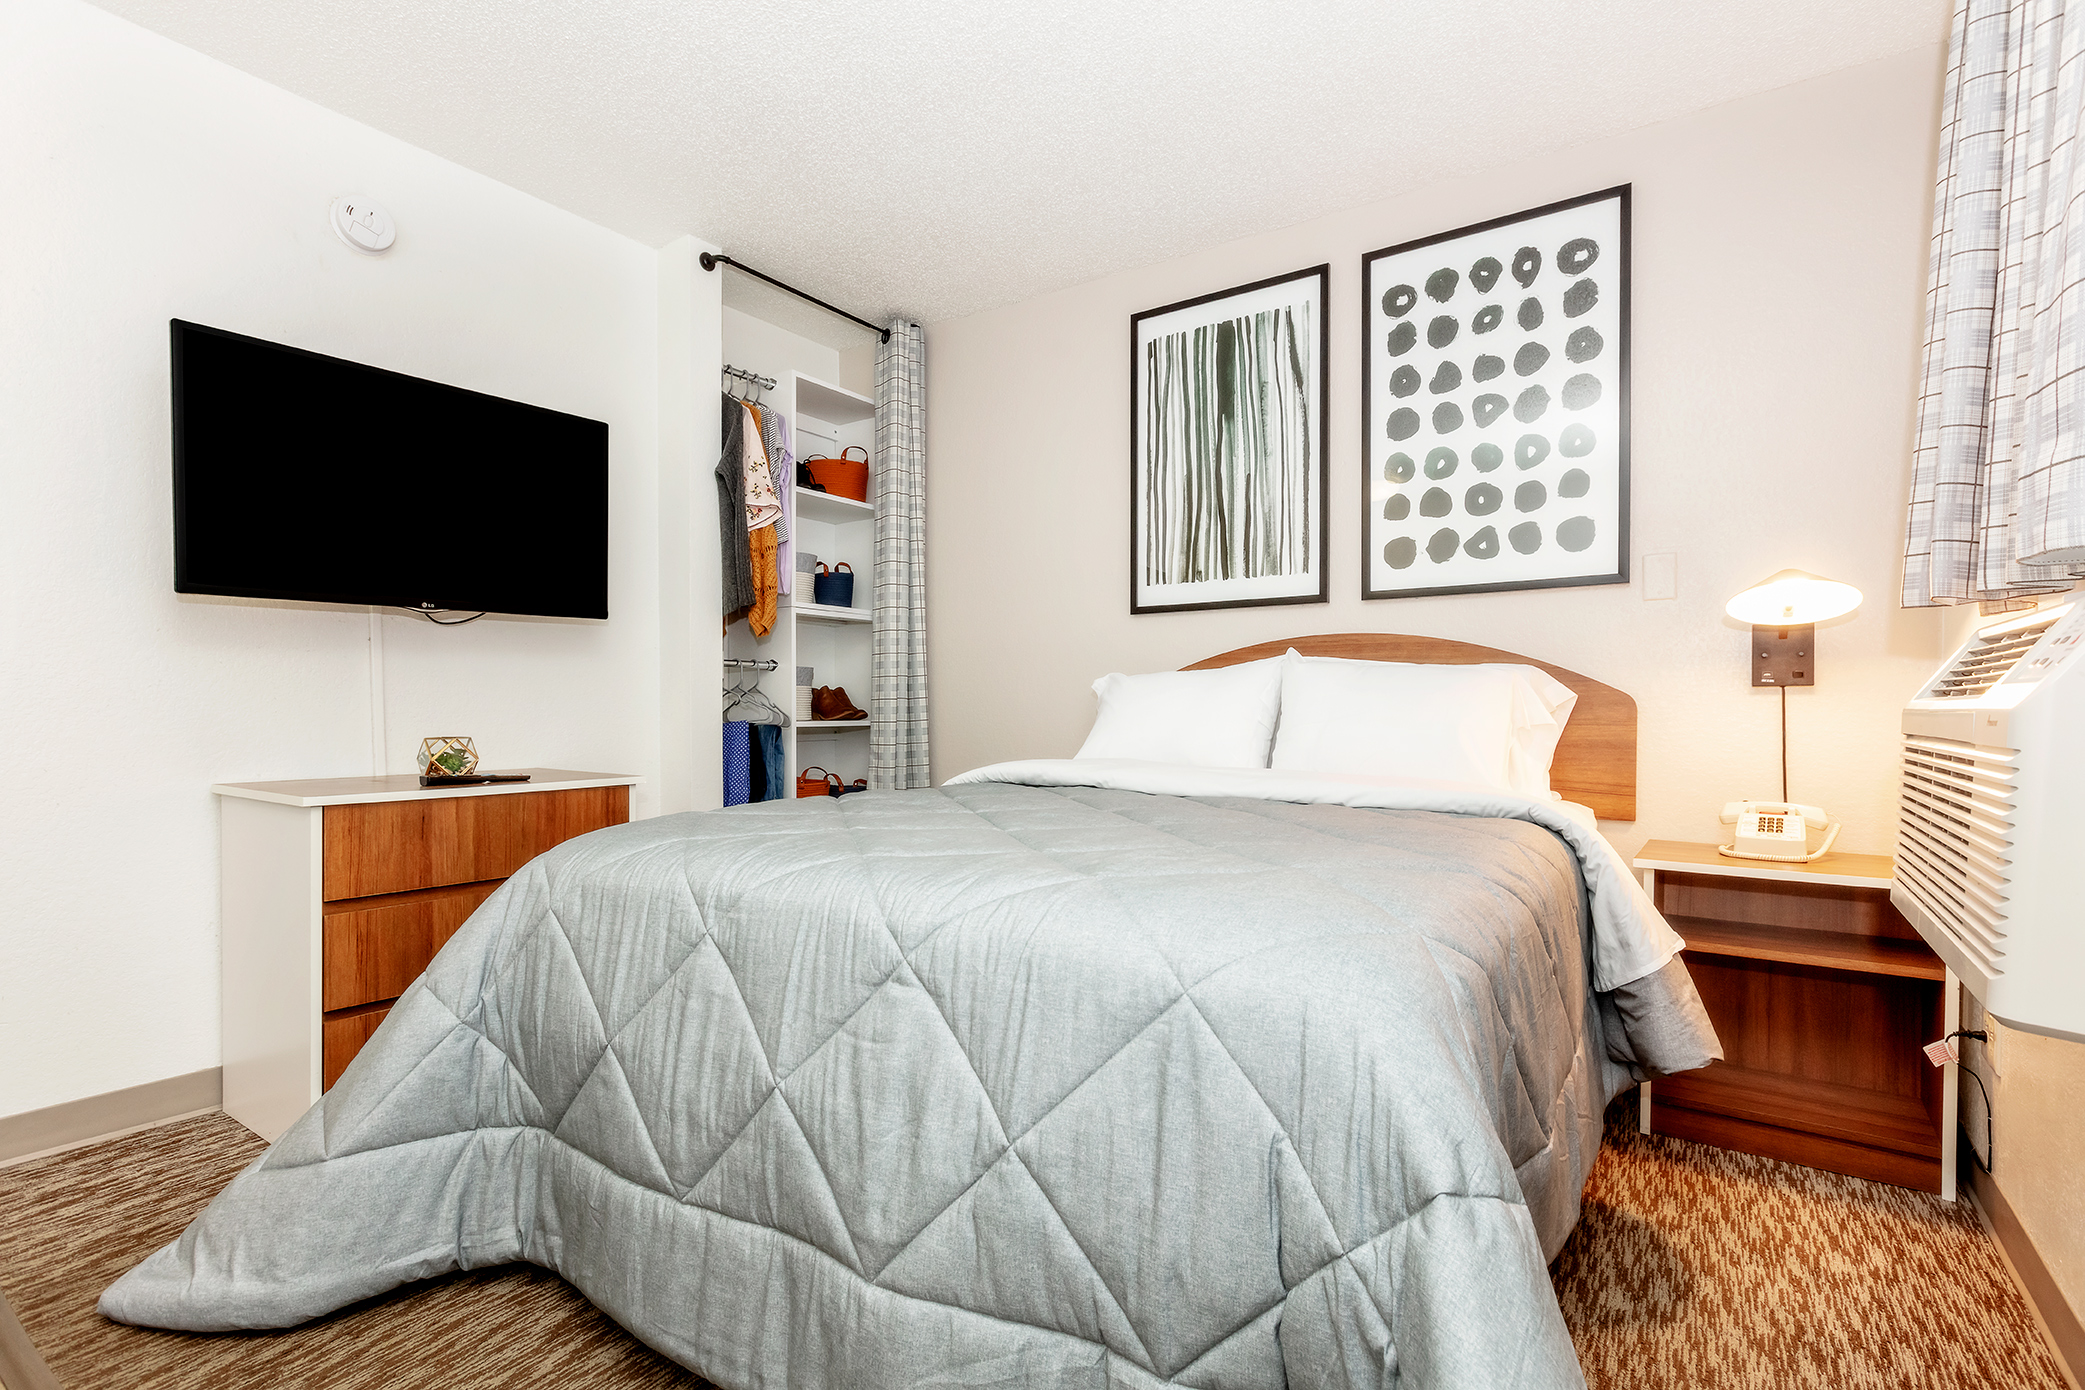 InTown Suites Extended Stay Birmingham AL - Southpark Drive